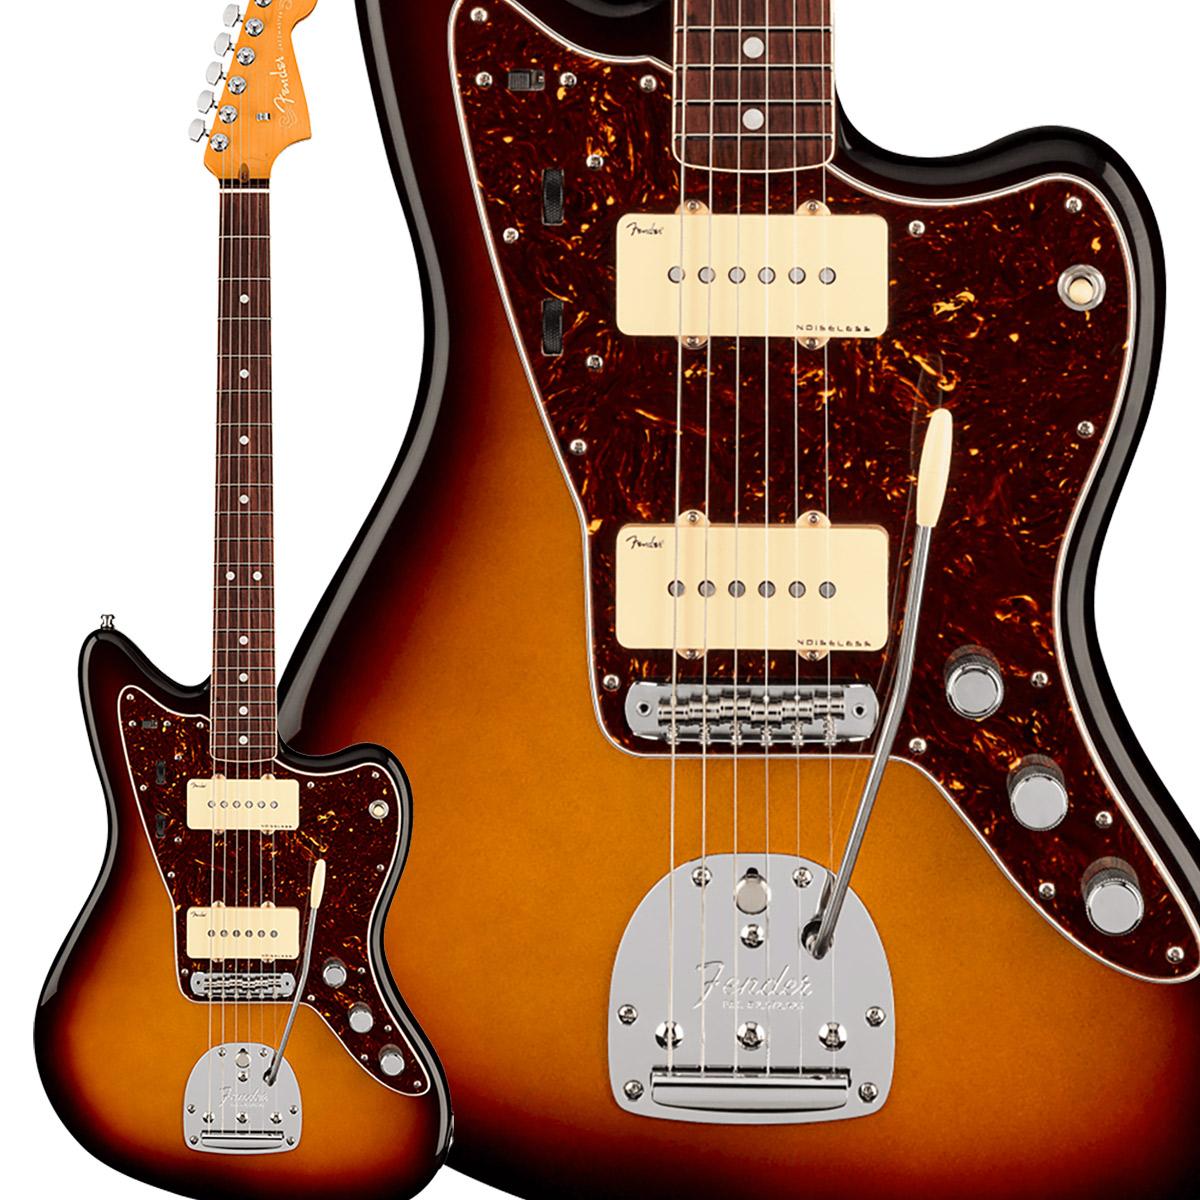 Fender American Ultra Jazzmaster Rosewood Fingerboard Ultraburst ジャズマスター 【フェンダー】